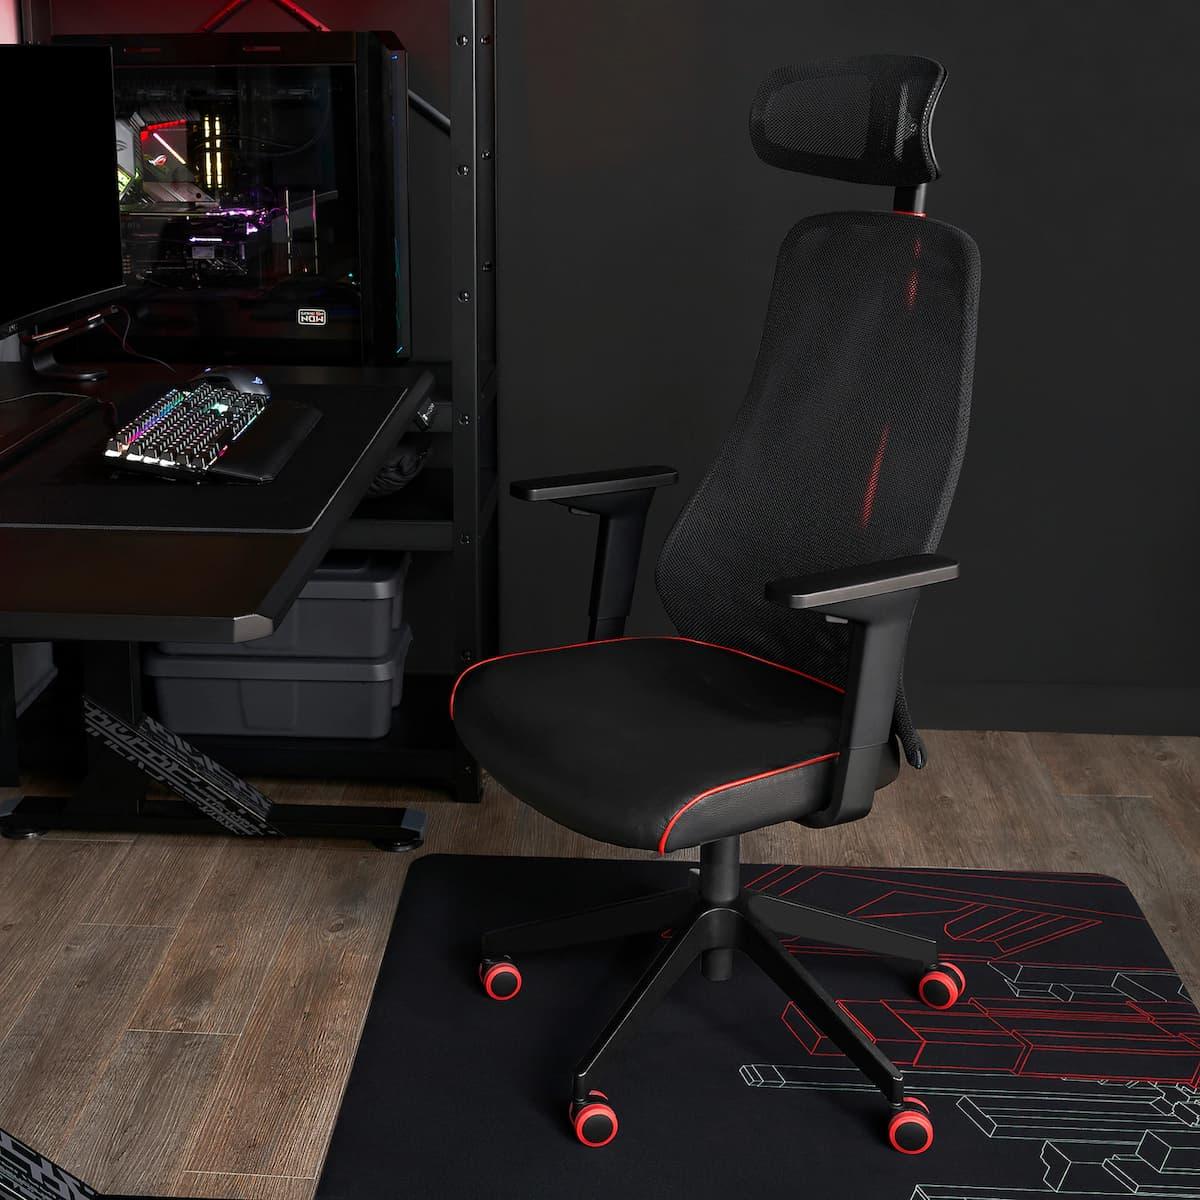 MATCHSPEL gaming chair(black)